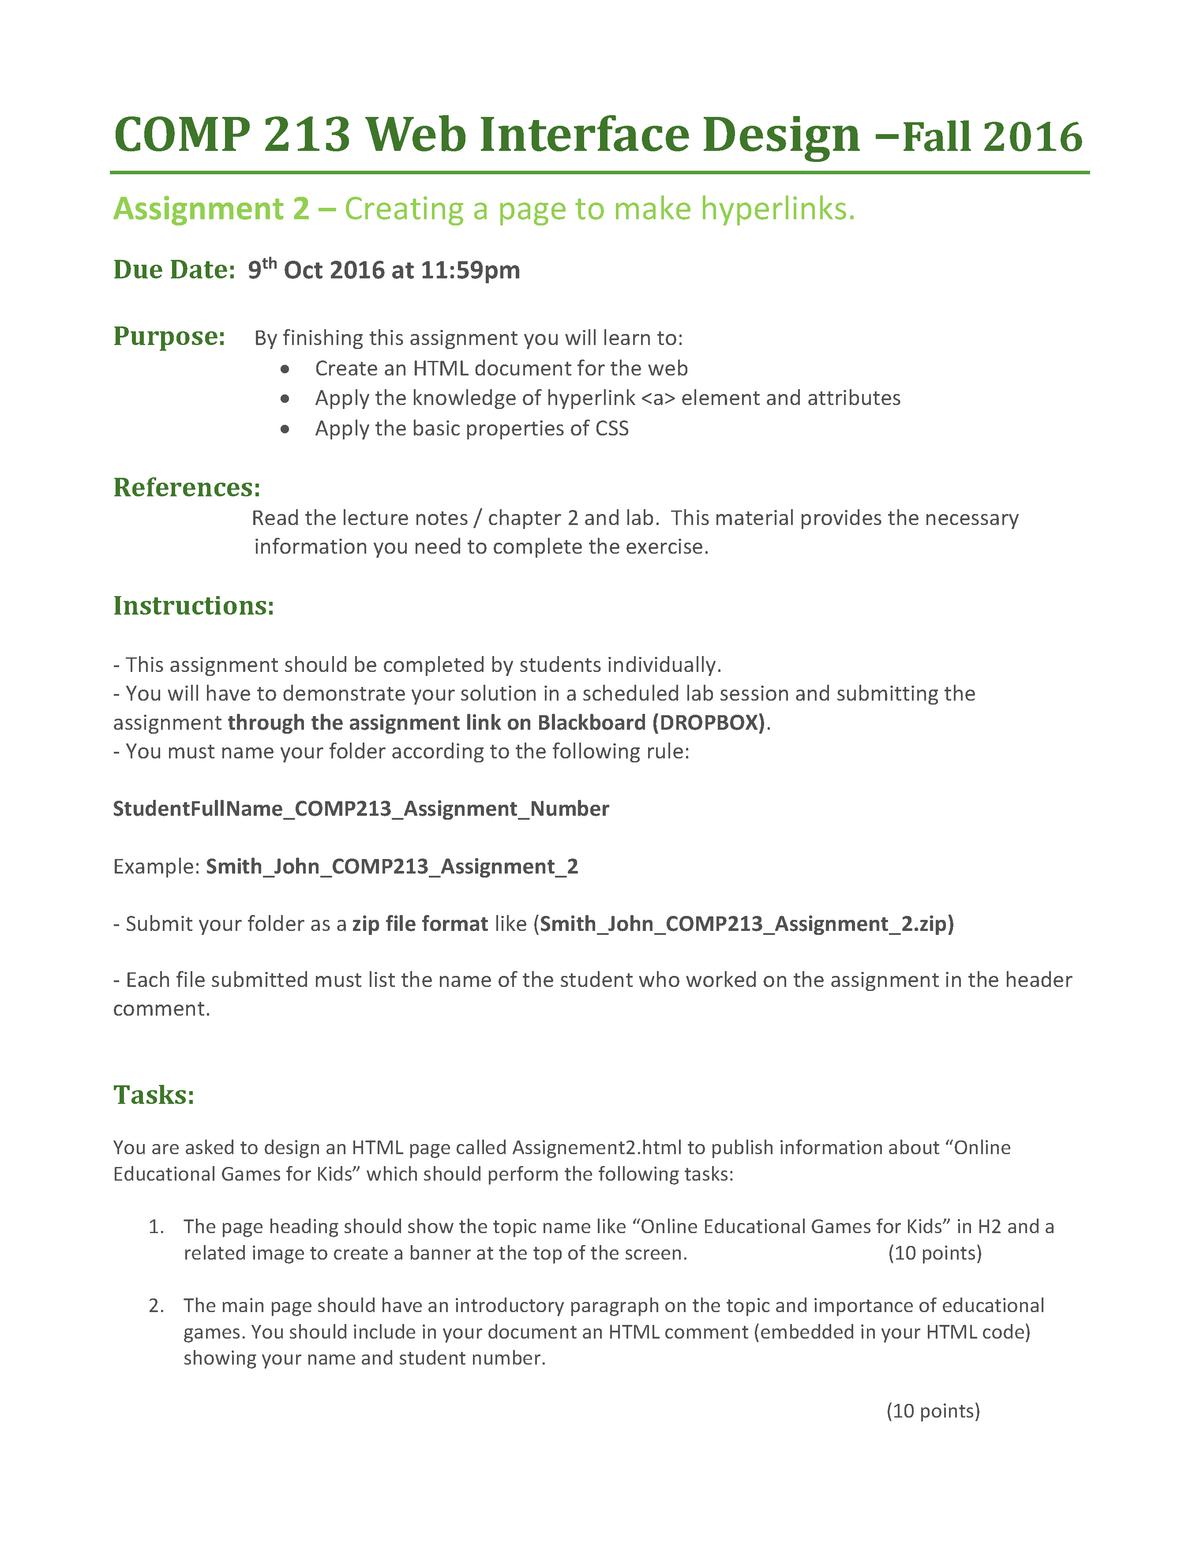 Assignment 2 COMP213 2016 F - COMP 213: Web Interface Design - StuDocu